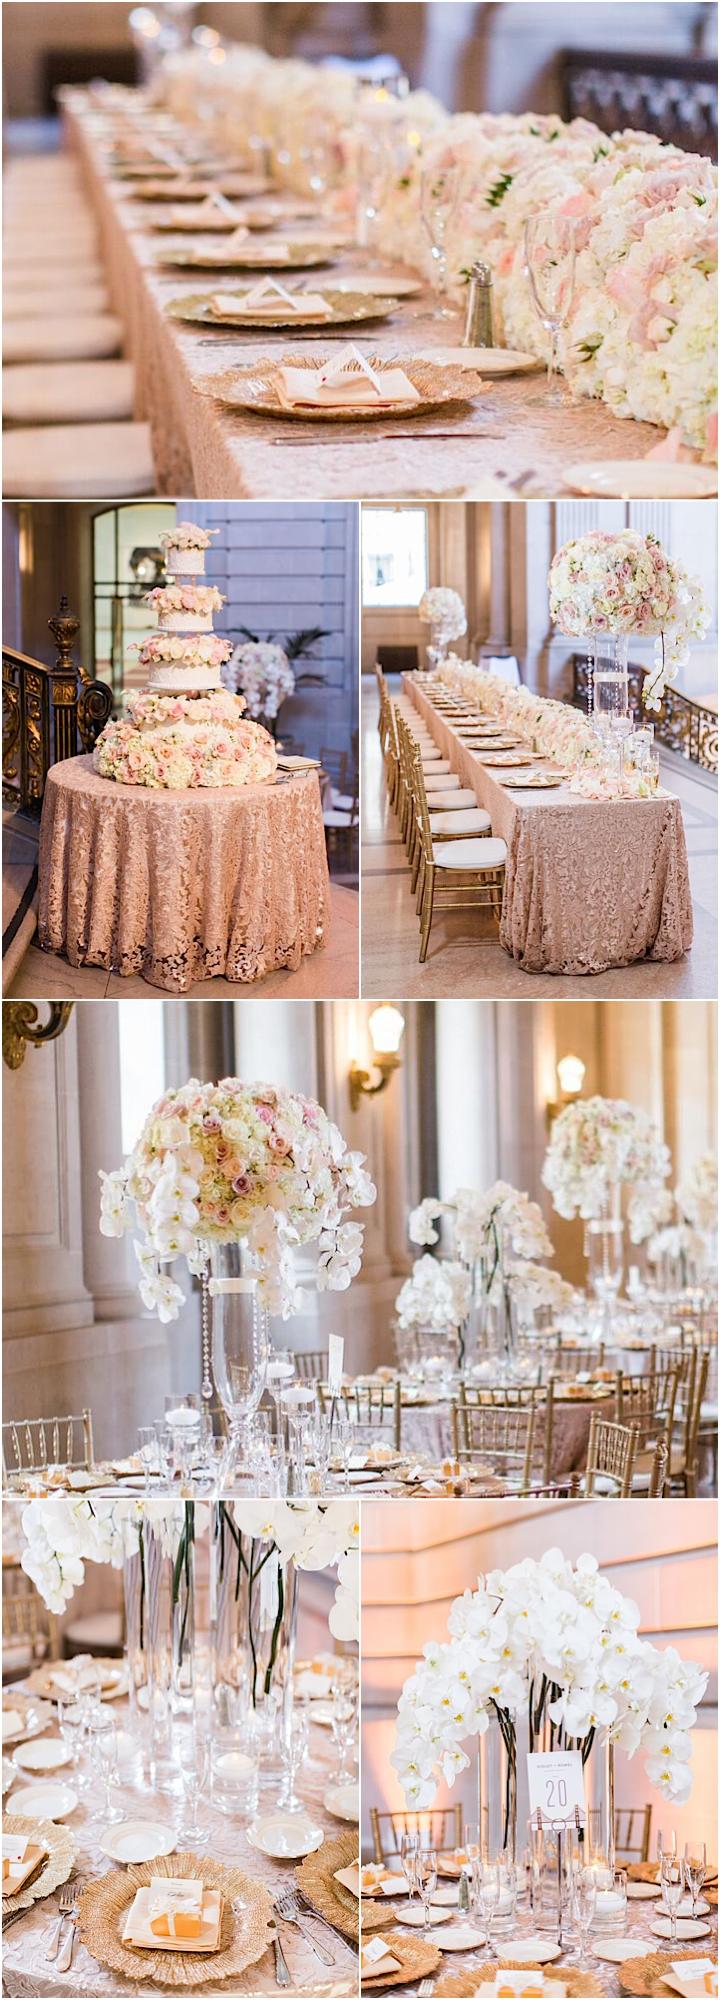 Breathtaking San Francisco Wedding at City Hall Wedding